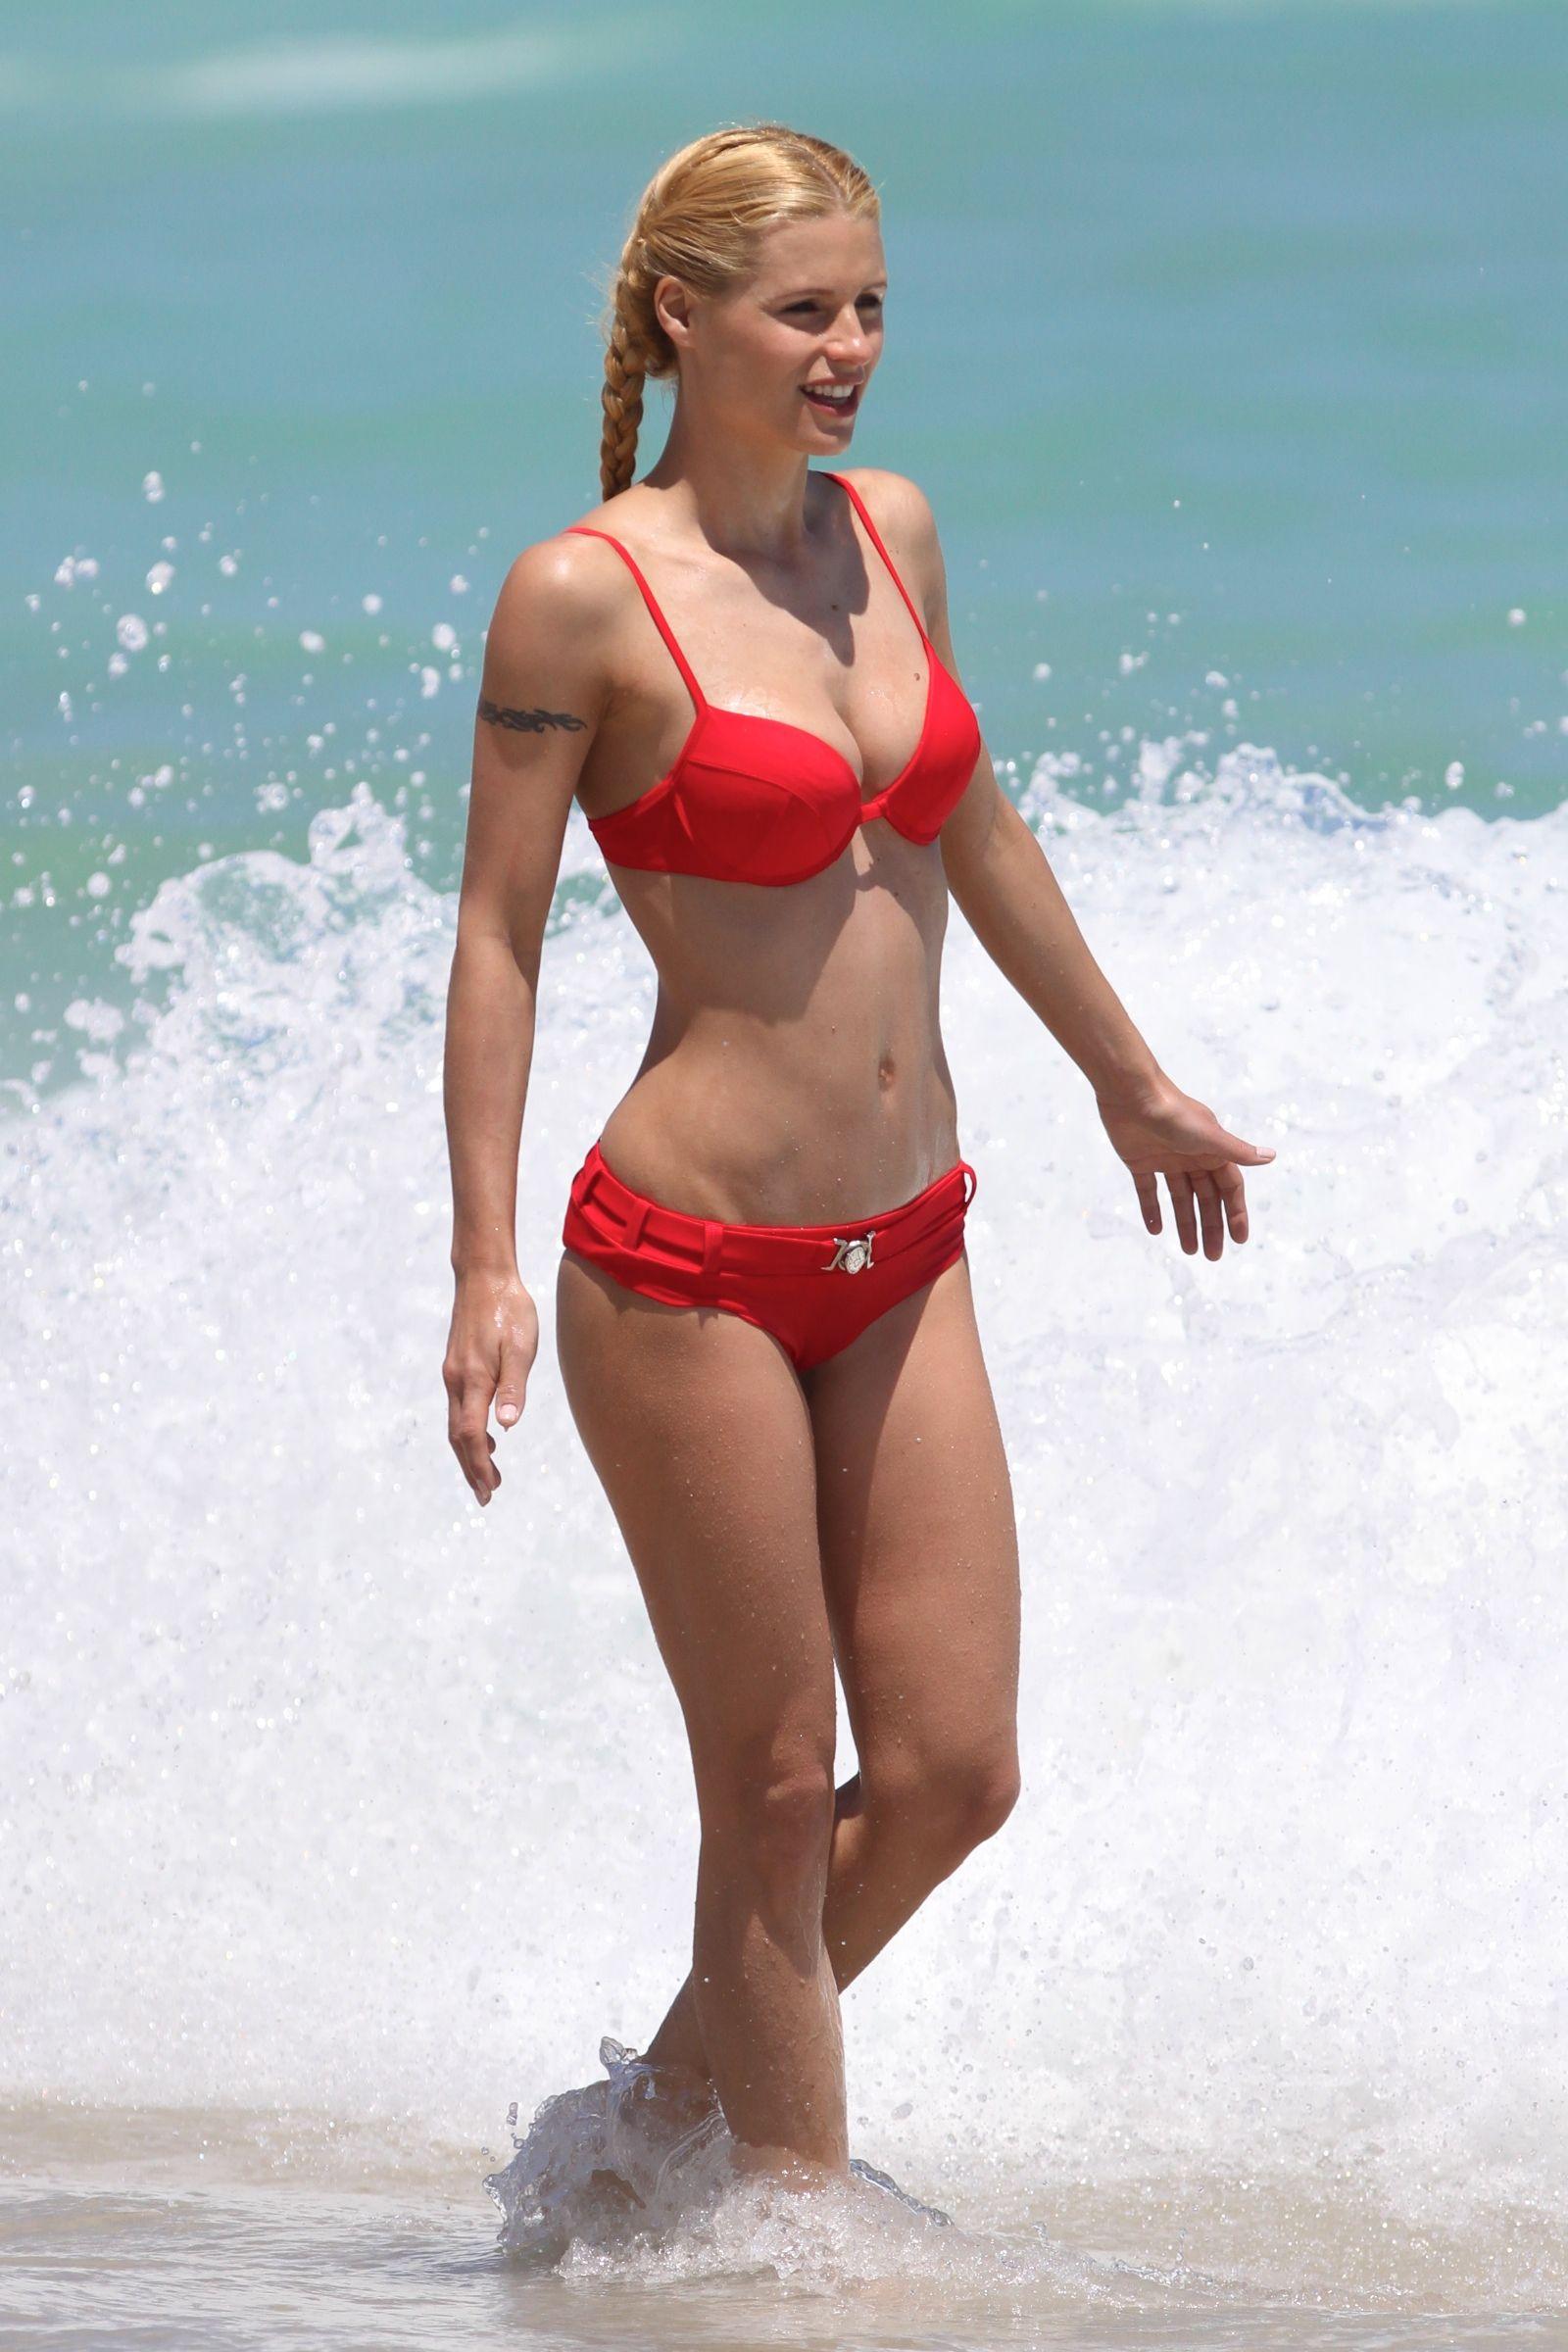 Michelle hunziker bikini 2016